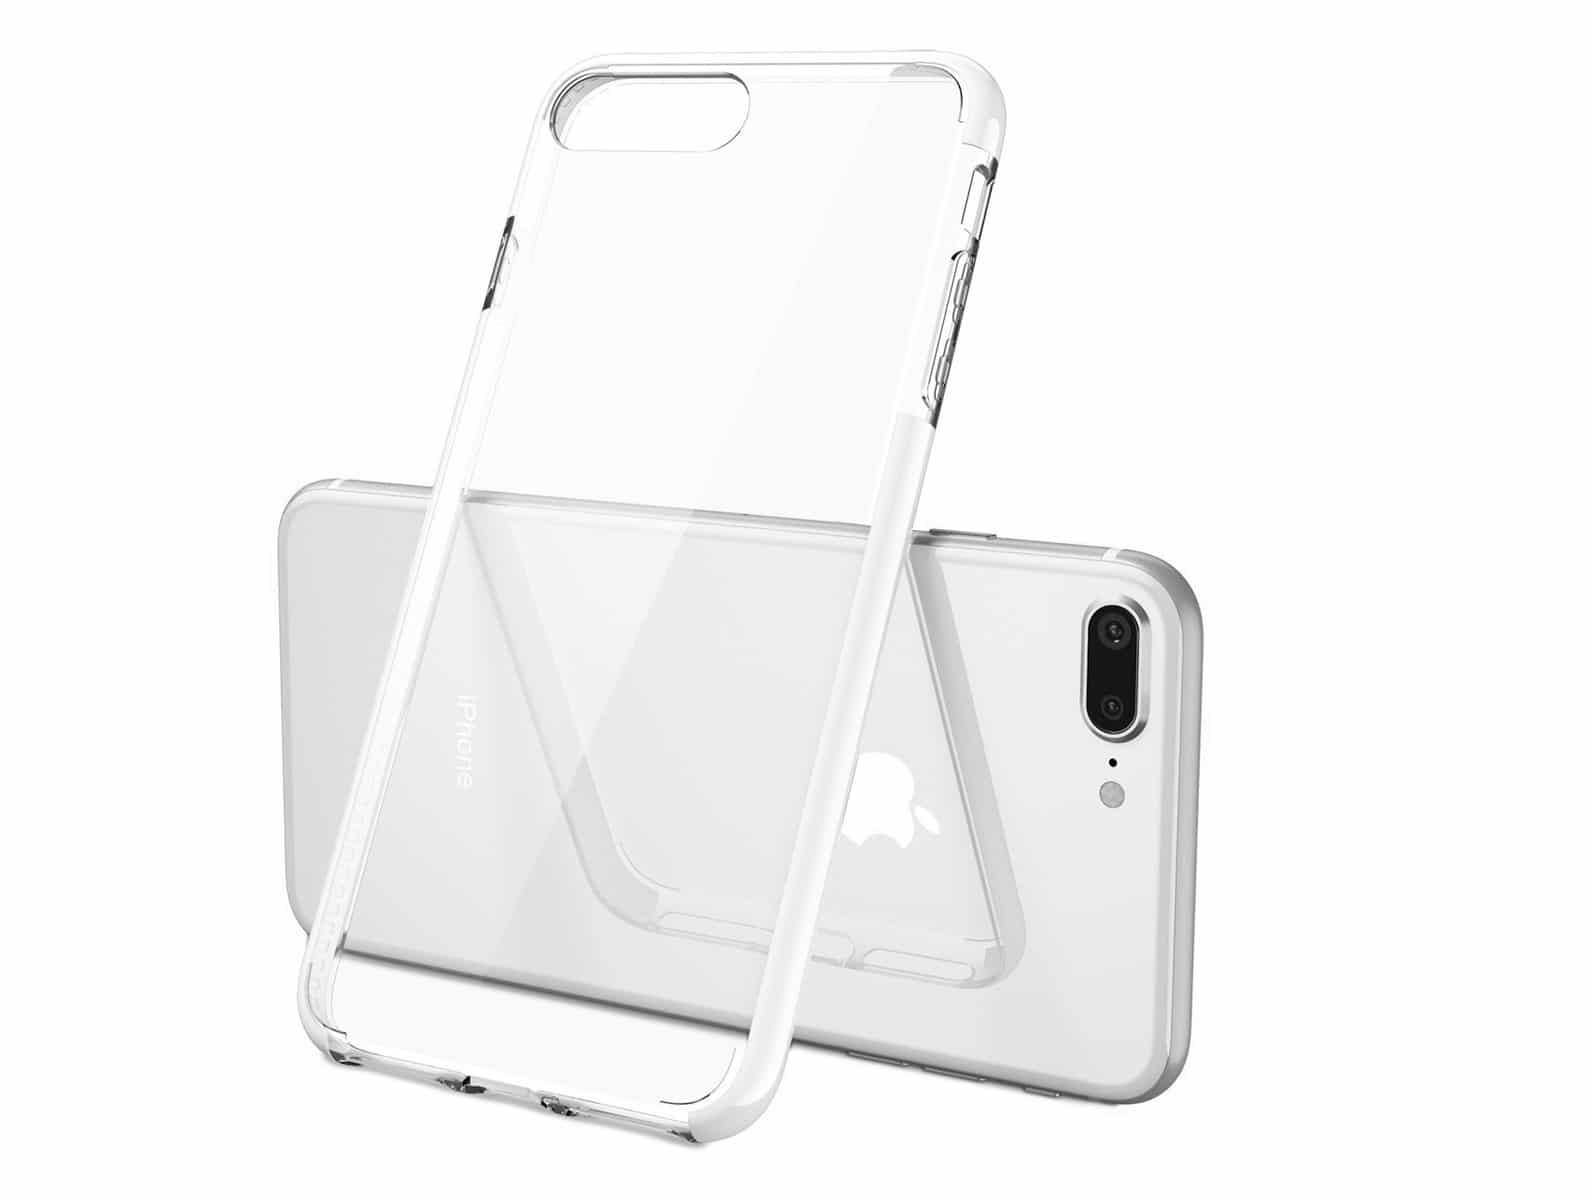 iFend Clear iPhone case